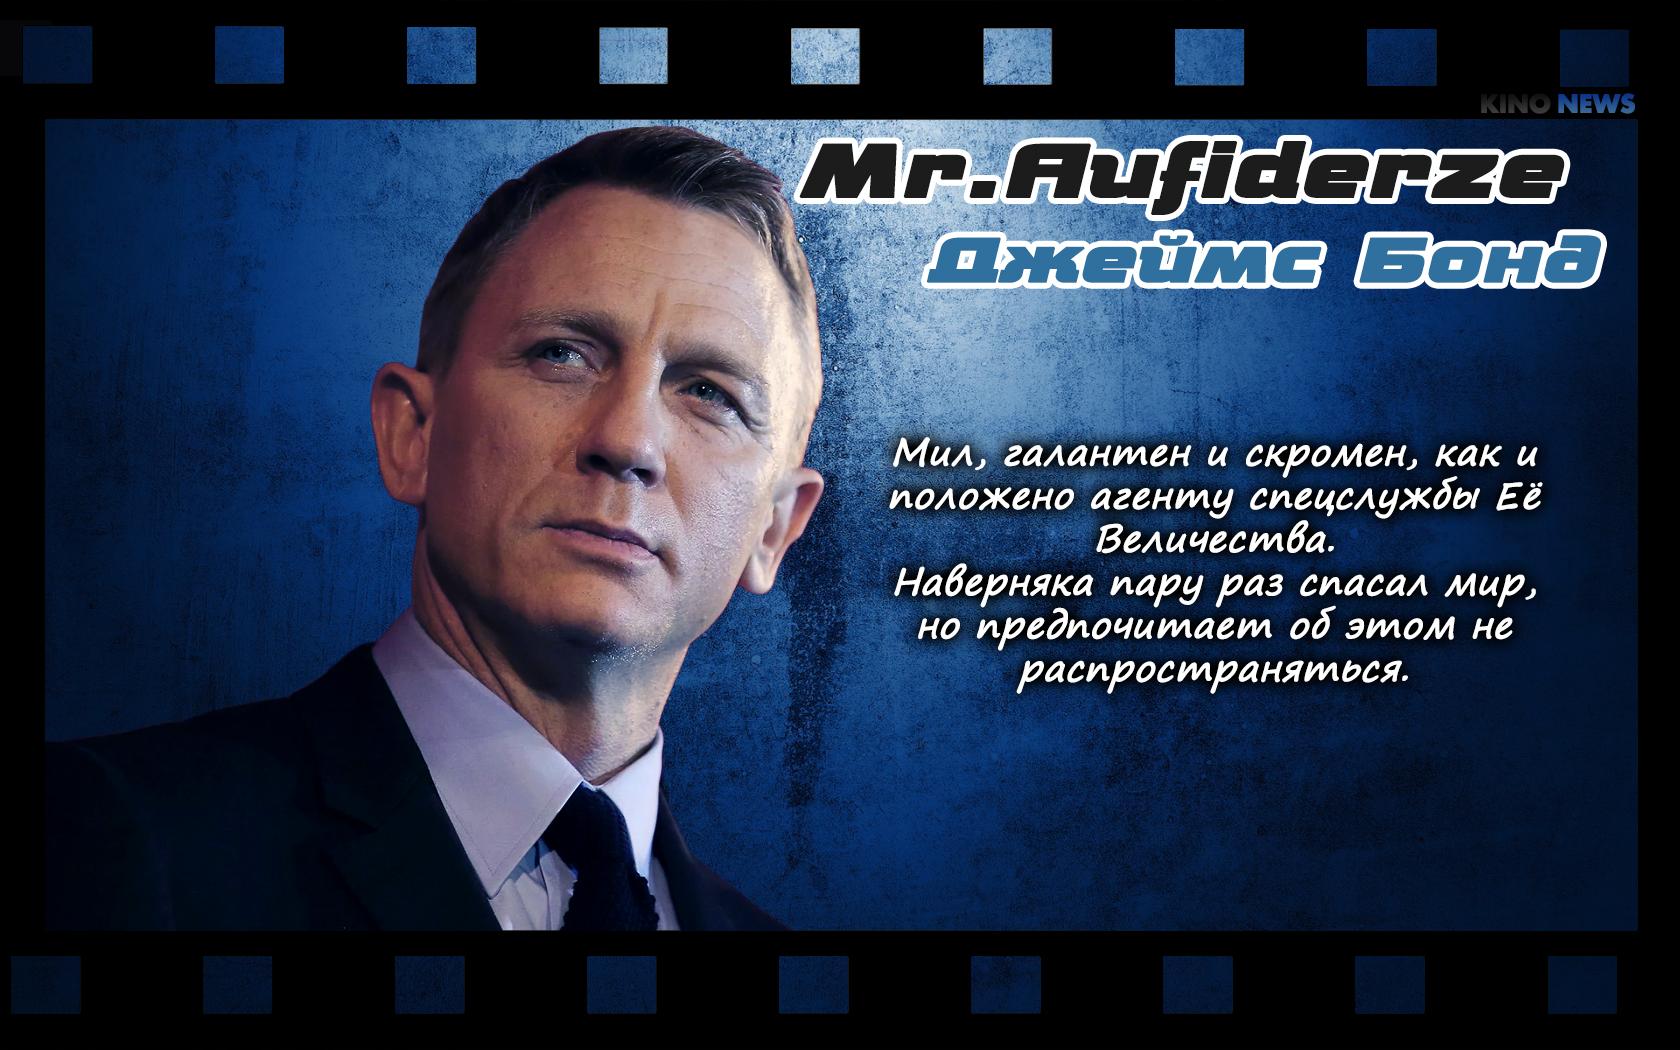 https://www.kinonews.ru/insimgs/2017/persimg/persimg77944_51.jpg